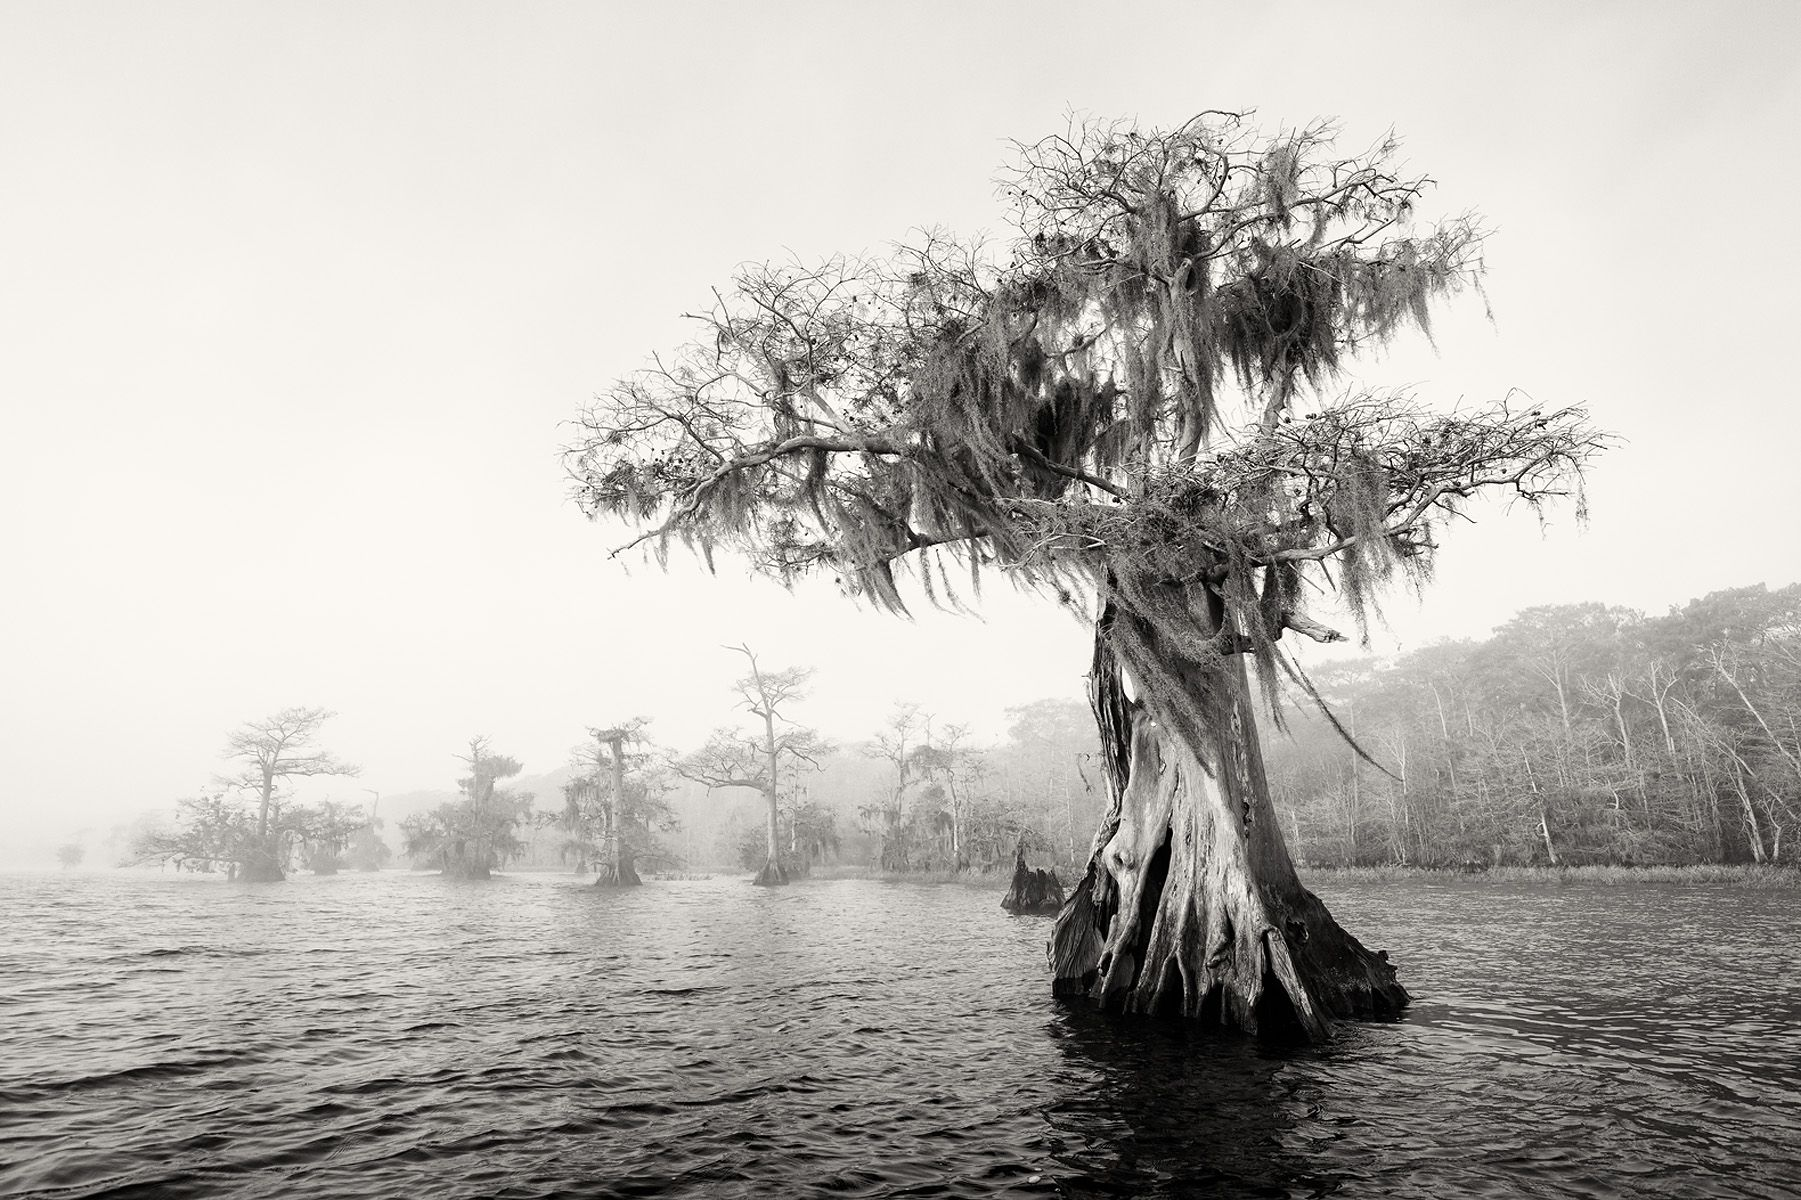 Cypress tree in the lake_B&W_S6A0160-Lake Blue Cypress, FL, USA.jpg